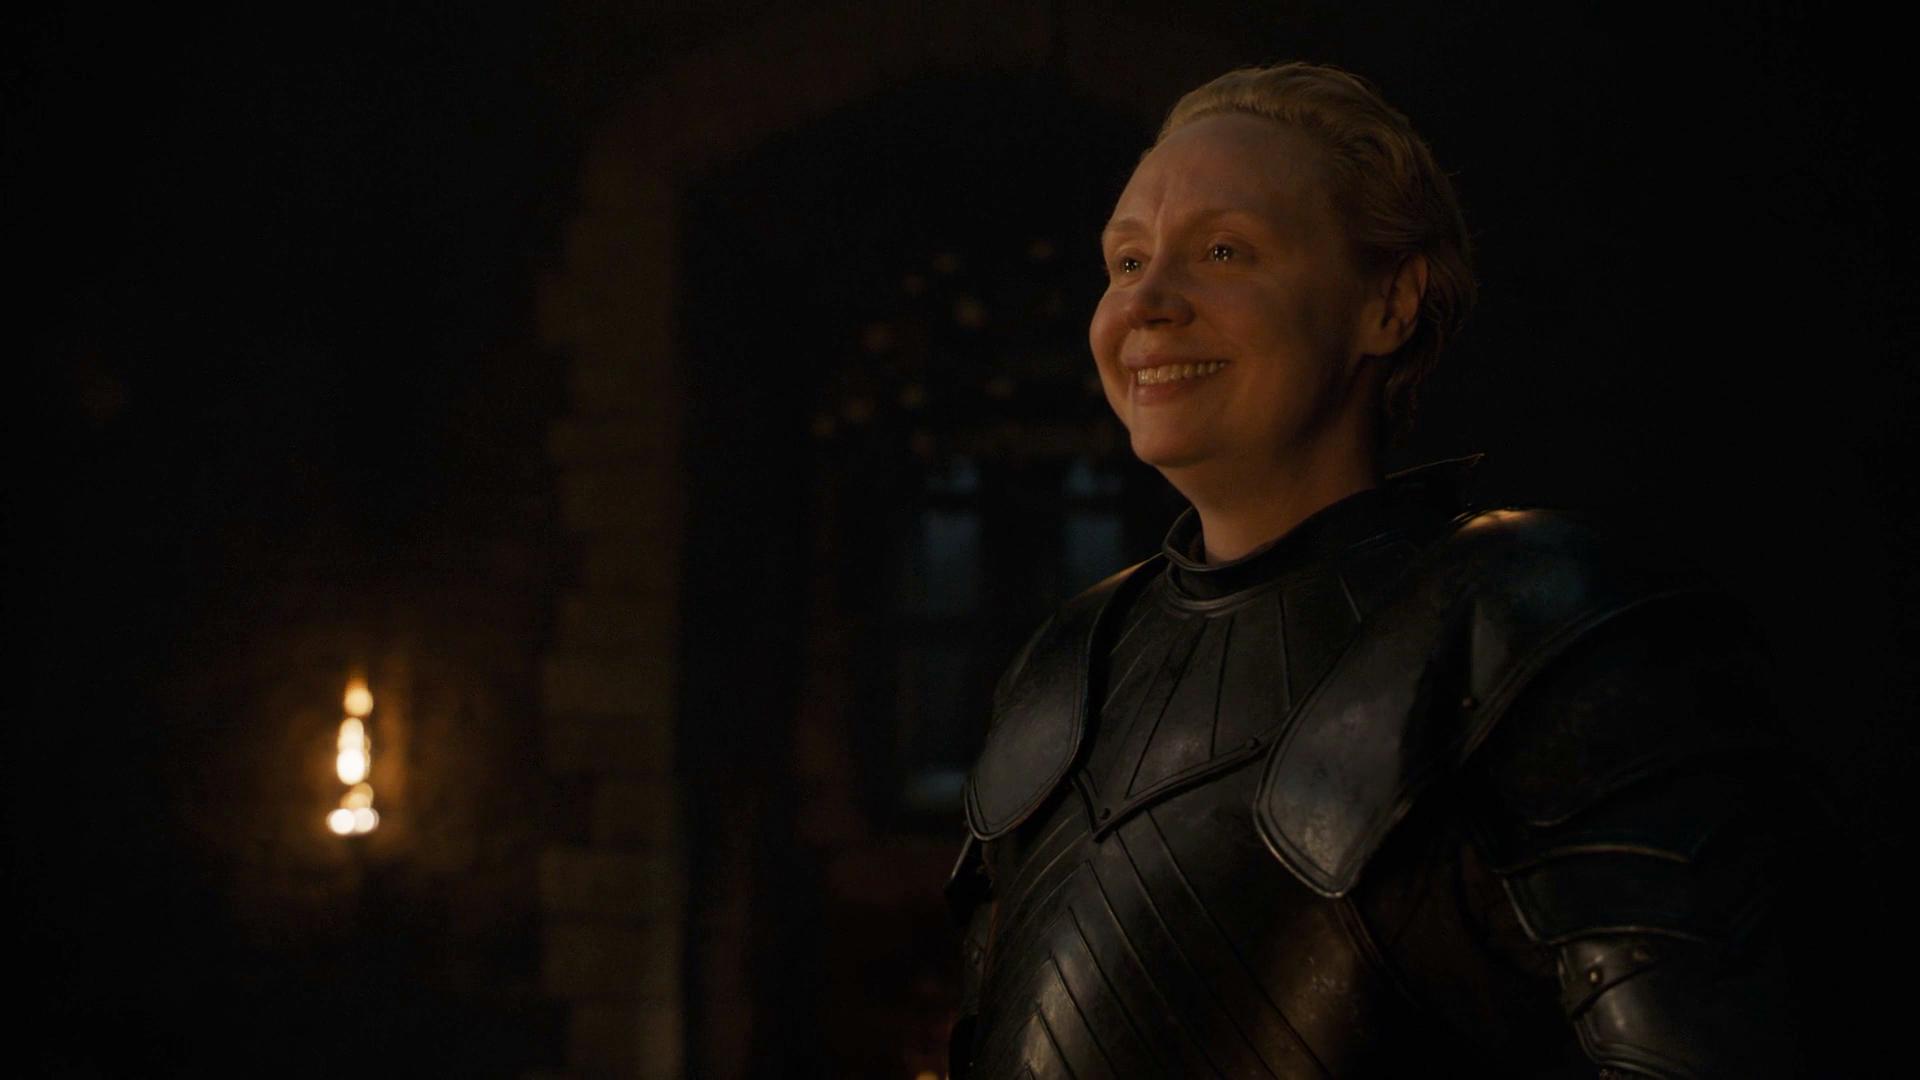 Brienne of Tarth Knight of the Seven Kingdoms Season 8 802